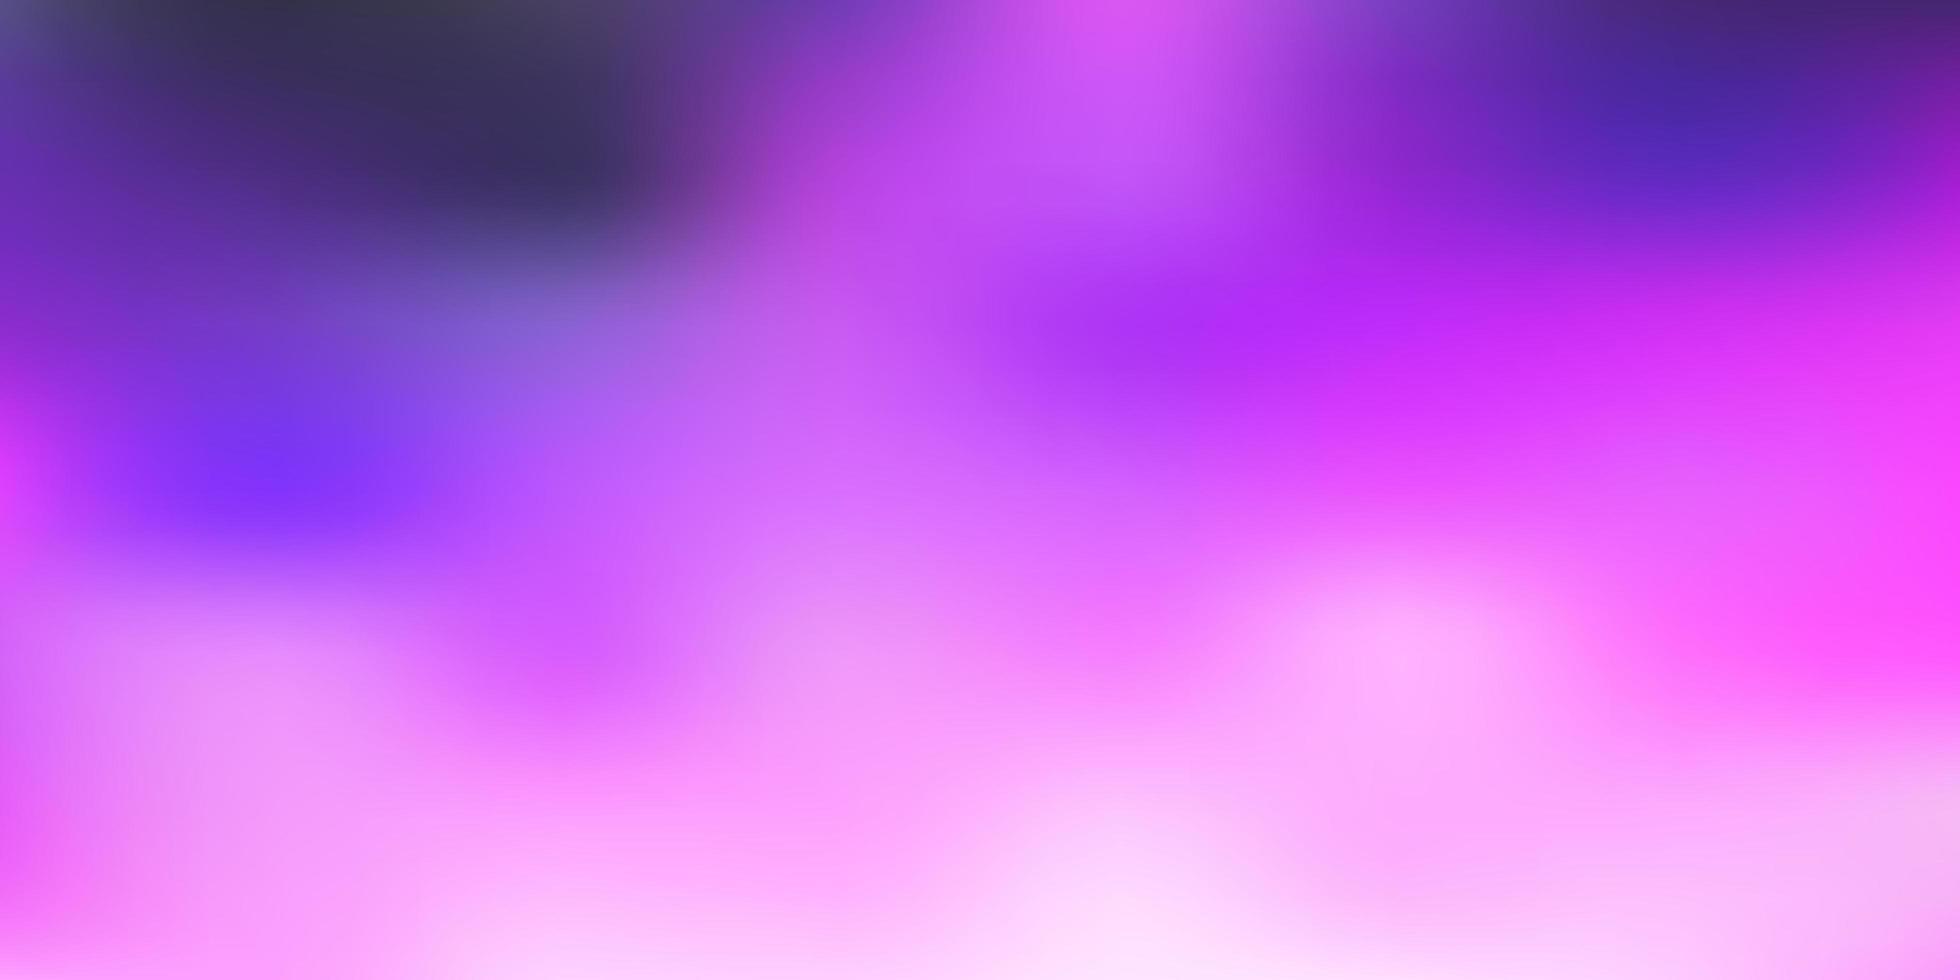 sfondo sfocato vettoriale viola chiaro.